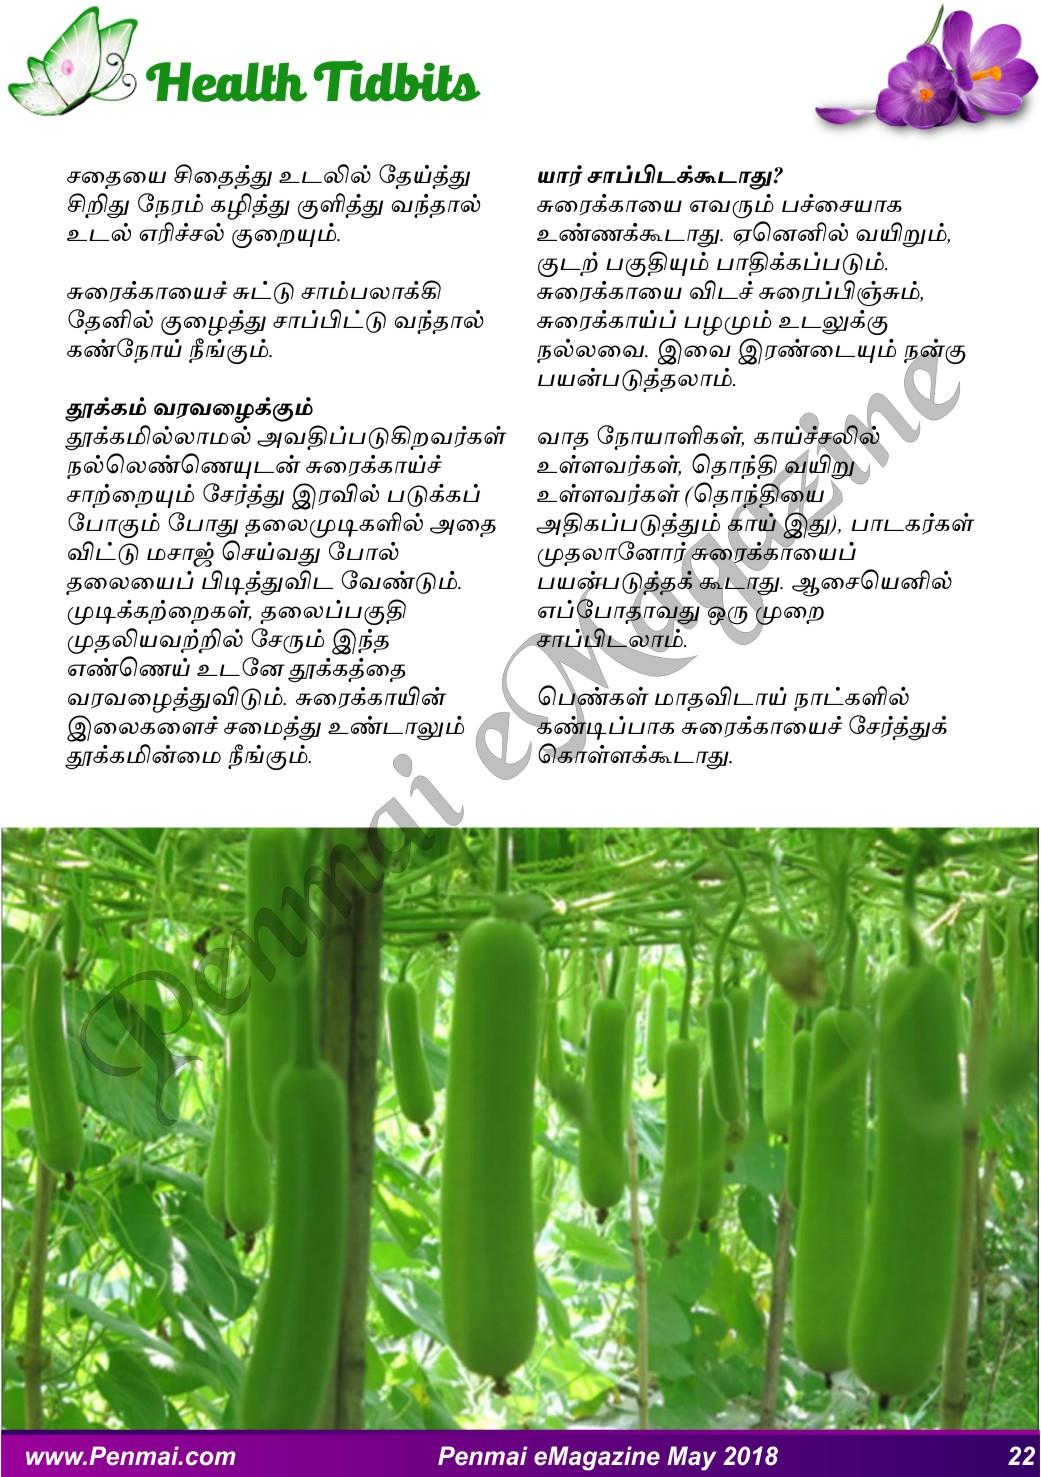 Penmai-eMagazine-May-2018-22.jpg